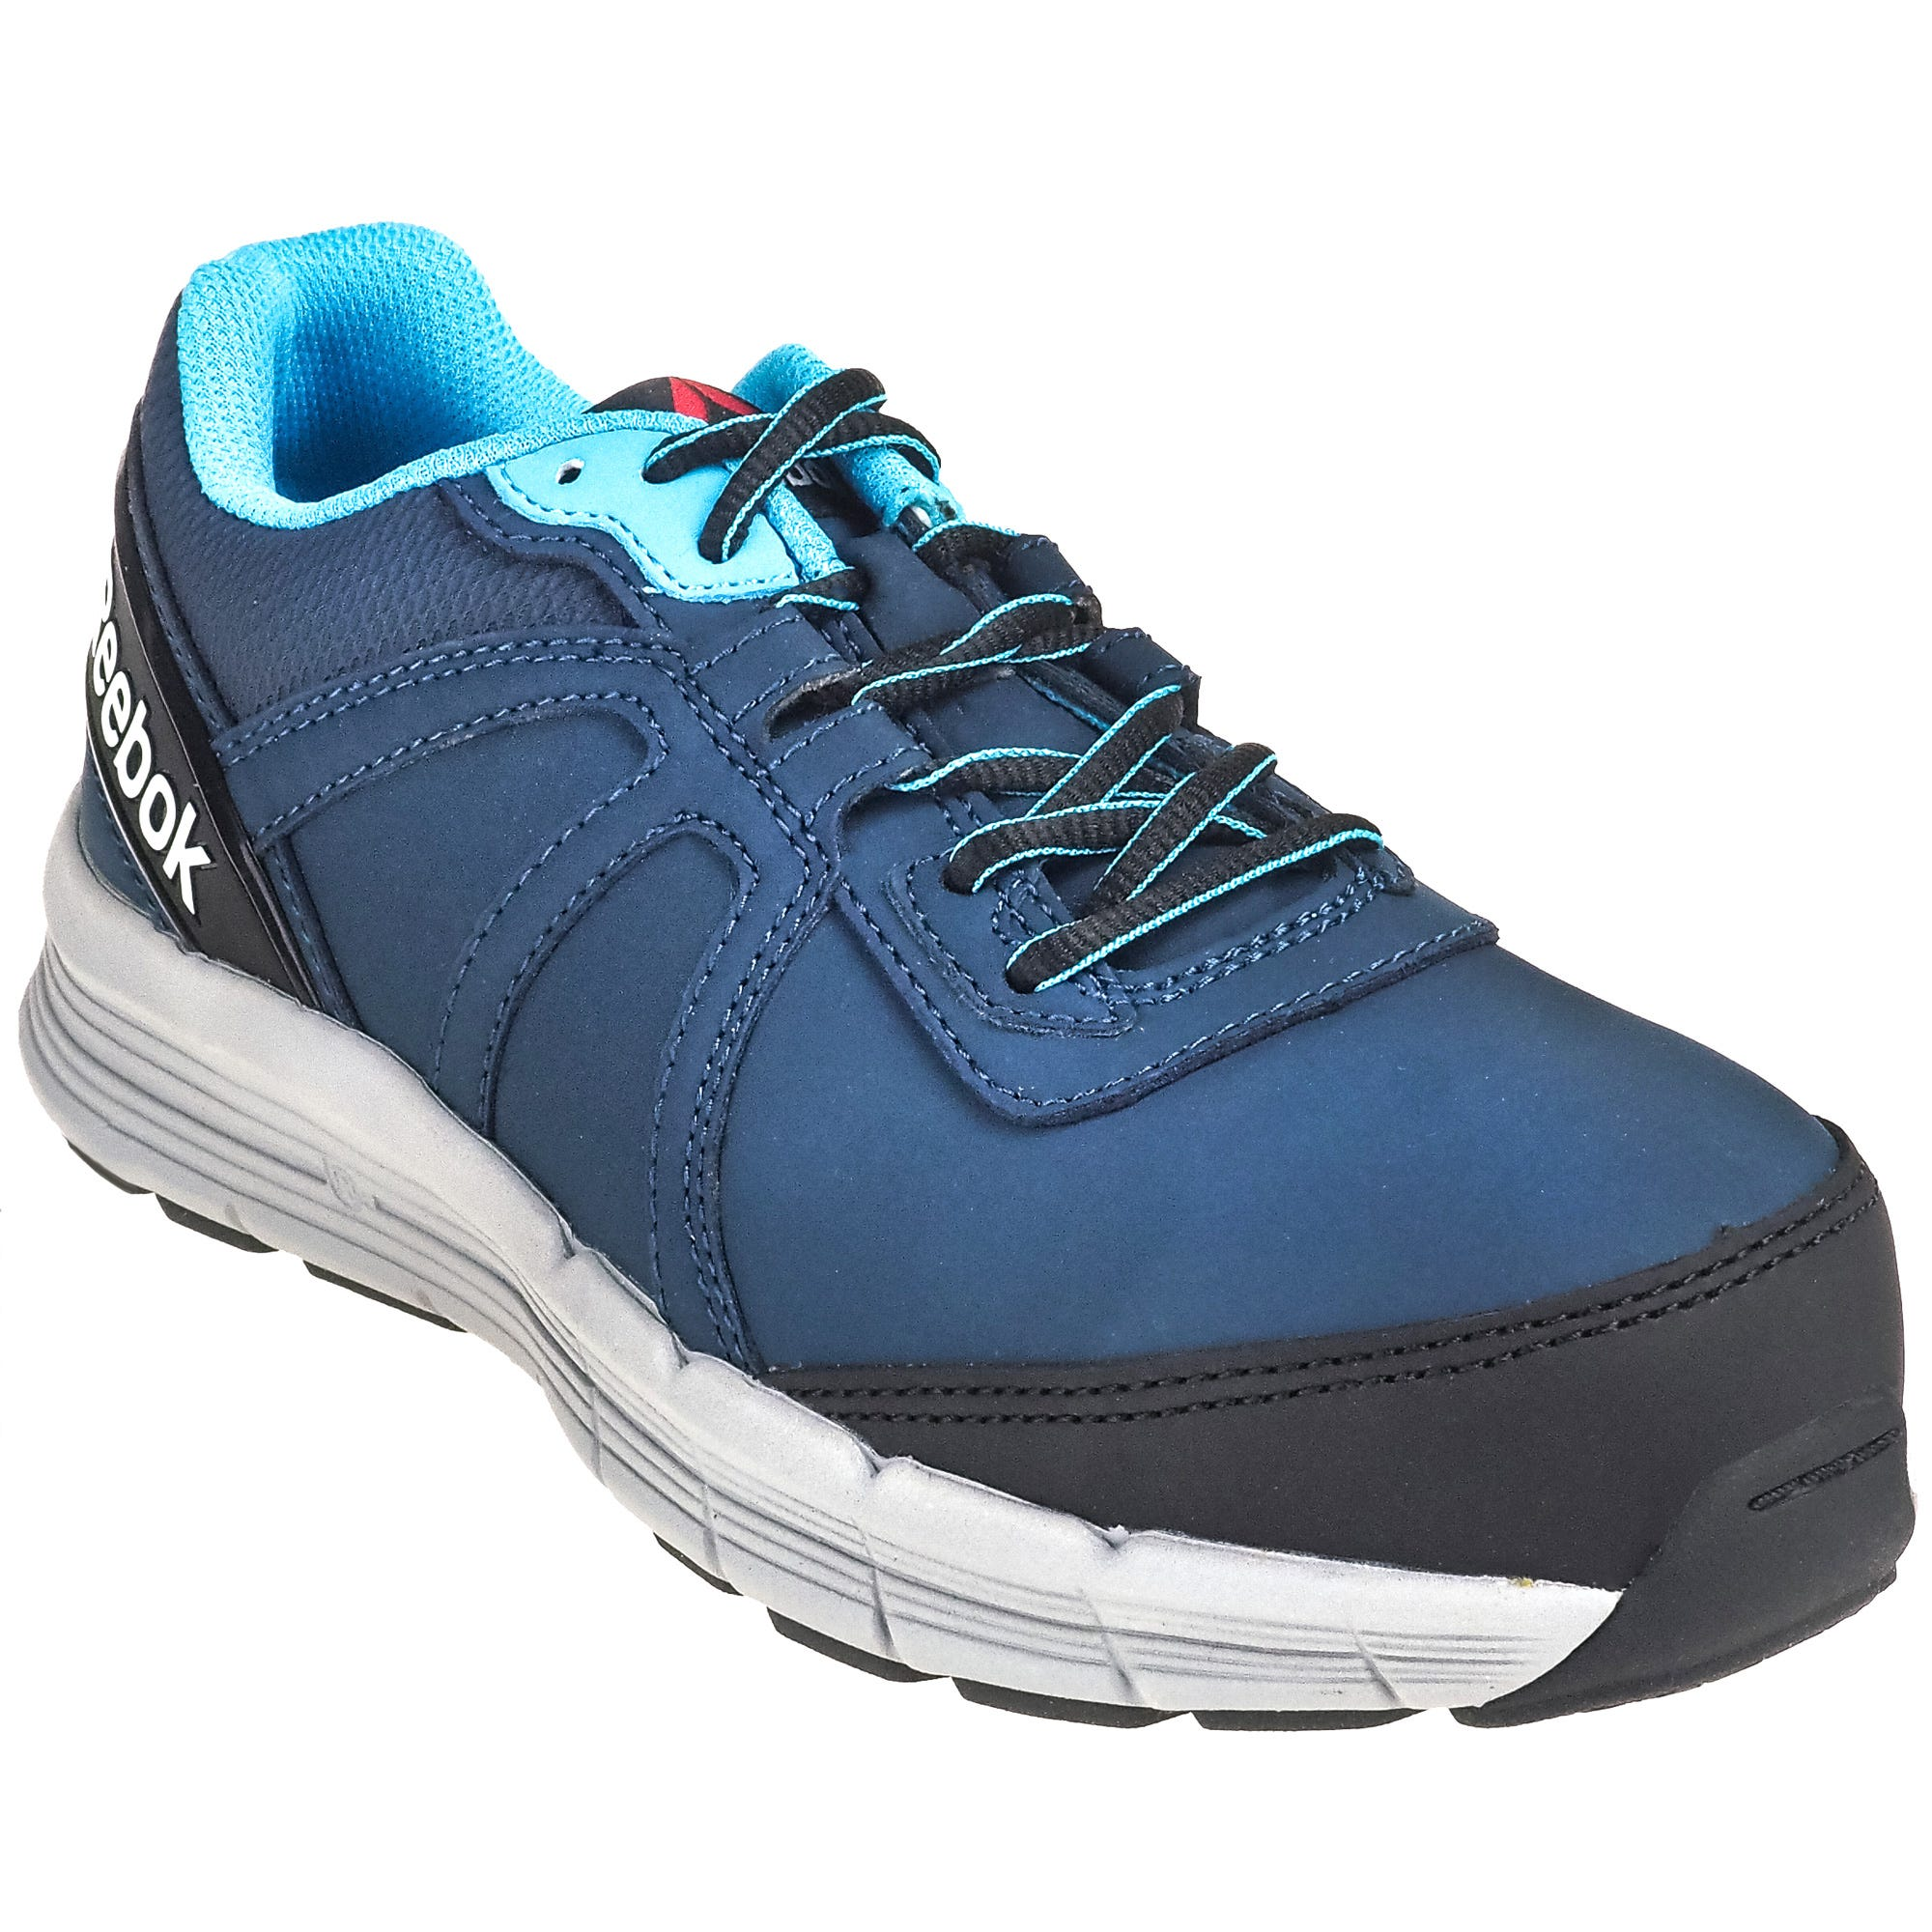 Reebok Women's RB354 Blue Steel Toe EH Guide Performance Cross Trainer Athletic Work Shoes